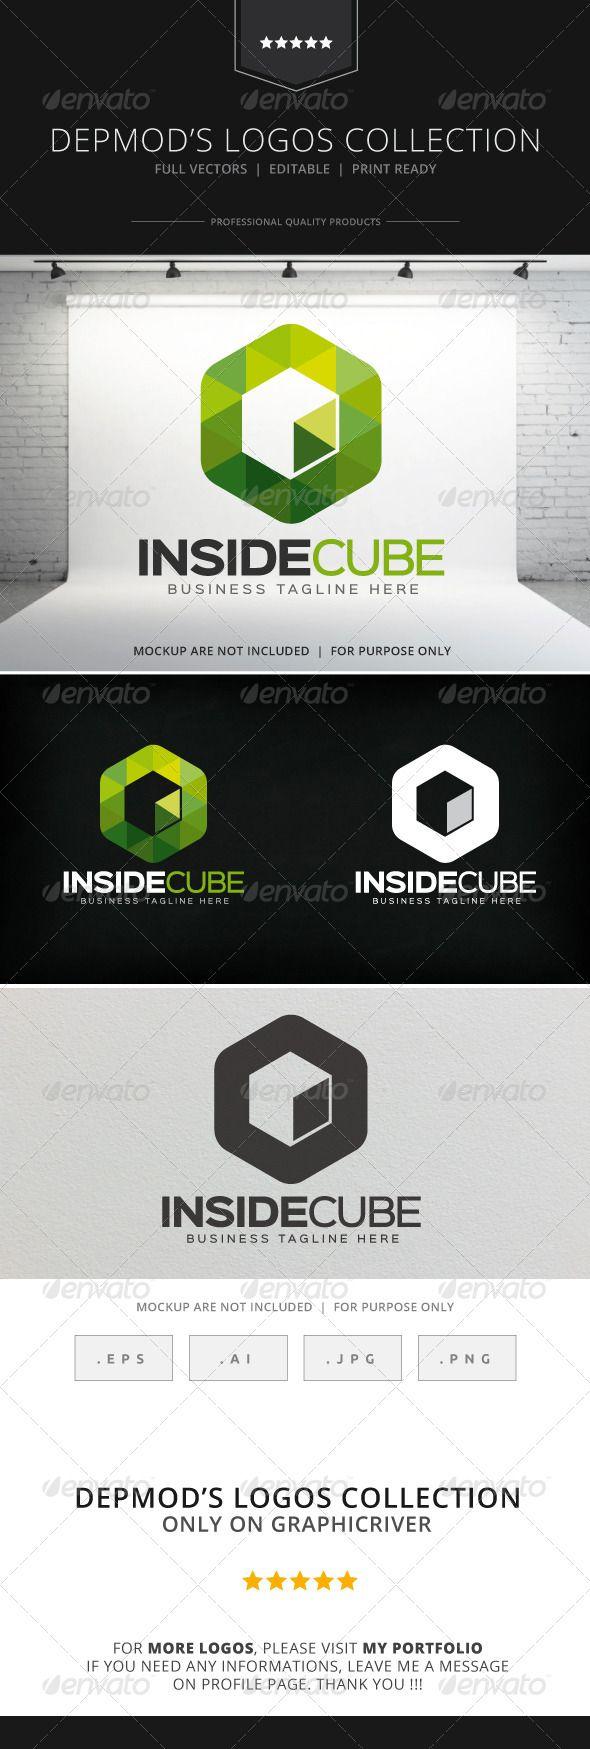 Inside Cube Logo — Vector EPS #modern #investment • Available here → https://graphicriver.net/item/inside-cube-logo/8745415?ref=pxcr